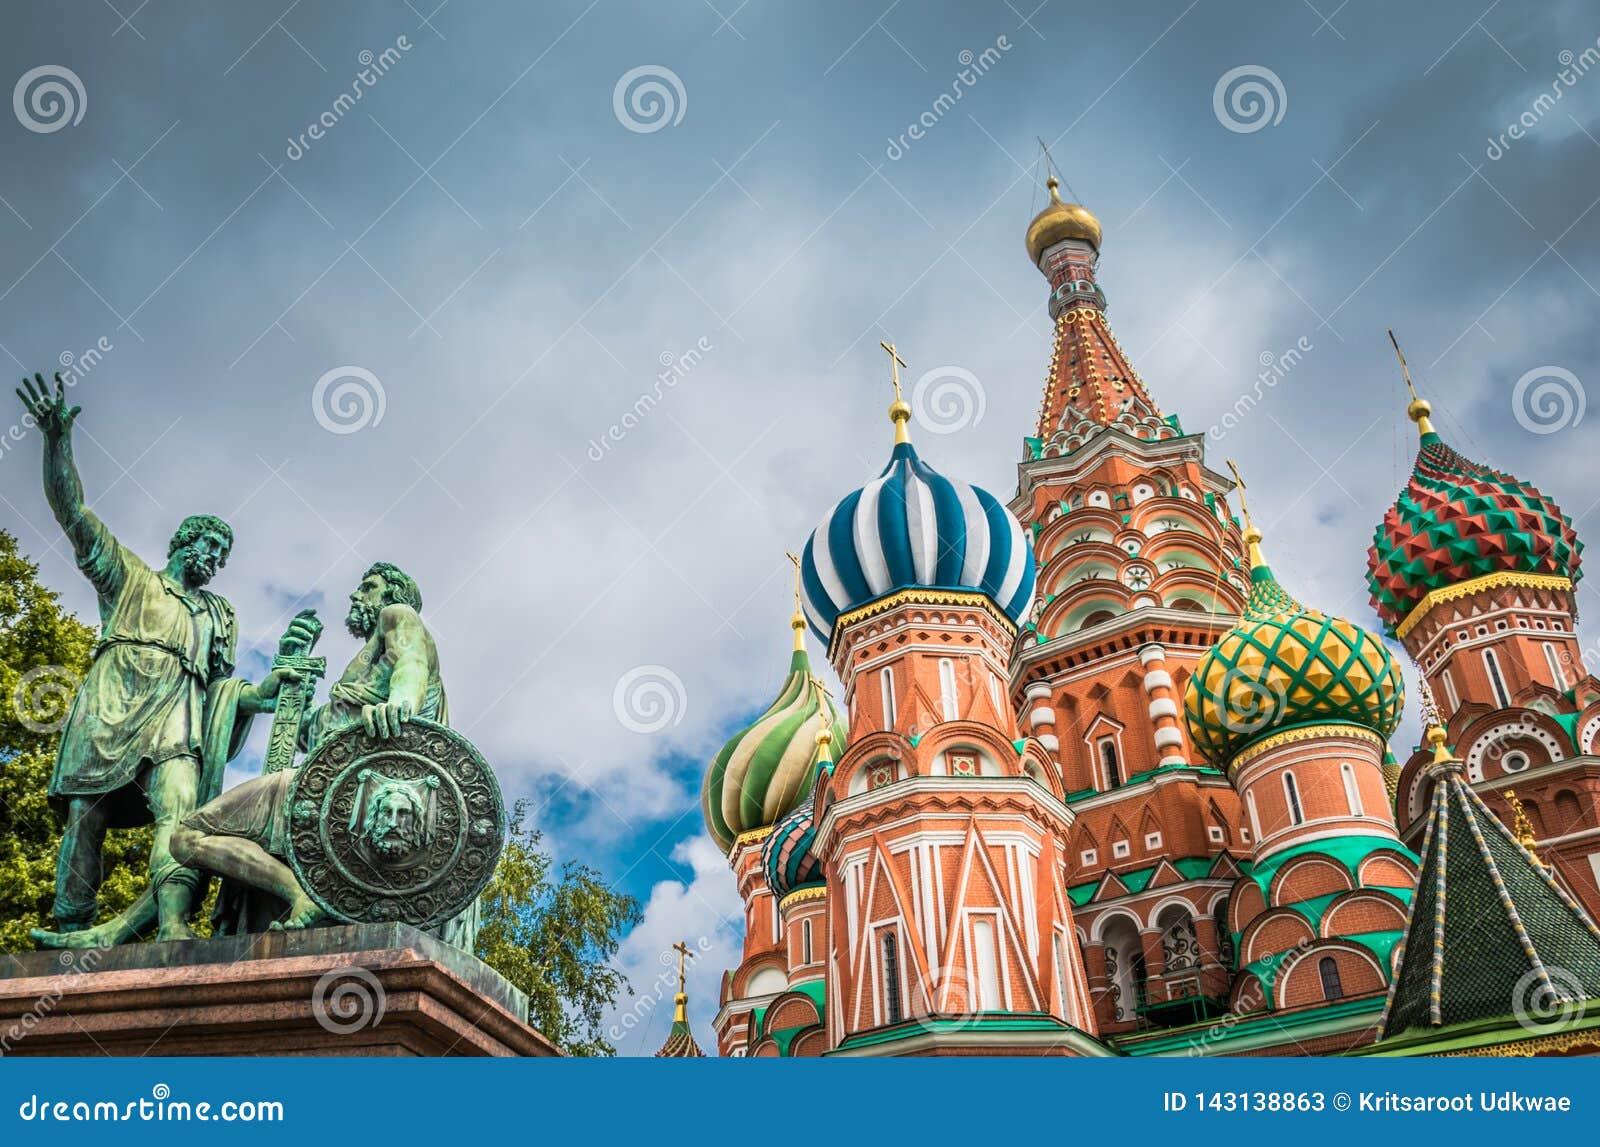 St蓬蒿的大教堂和纪念碑在红场在莫斯科,俄罗斯